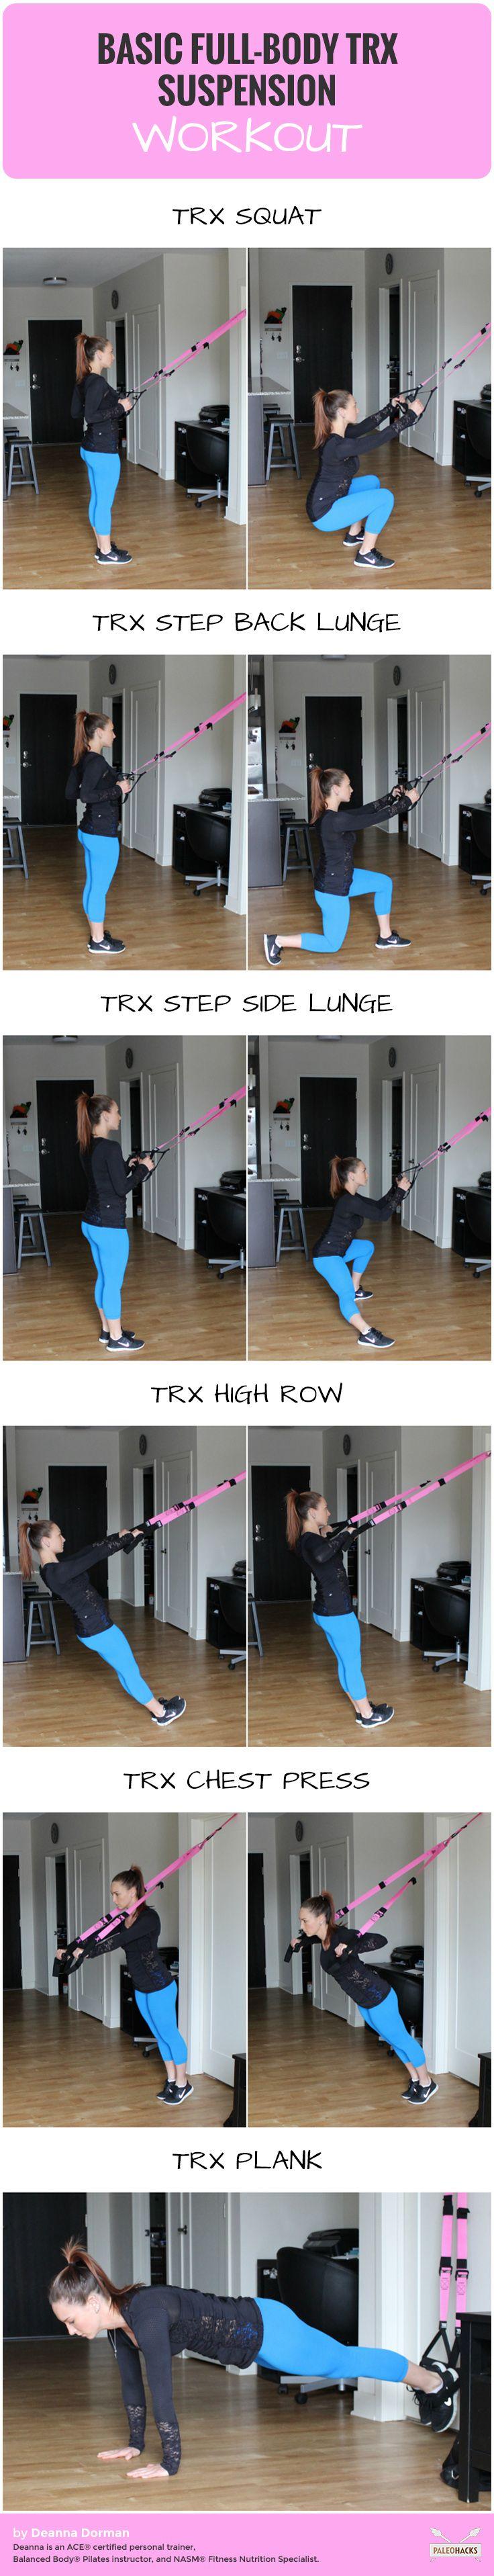 Basic Full Body TRX Suspension Workout